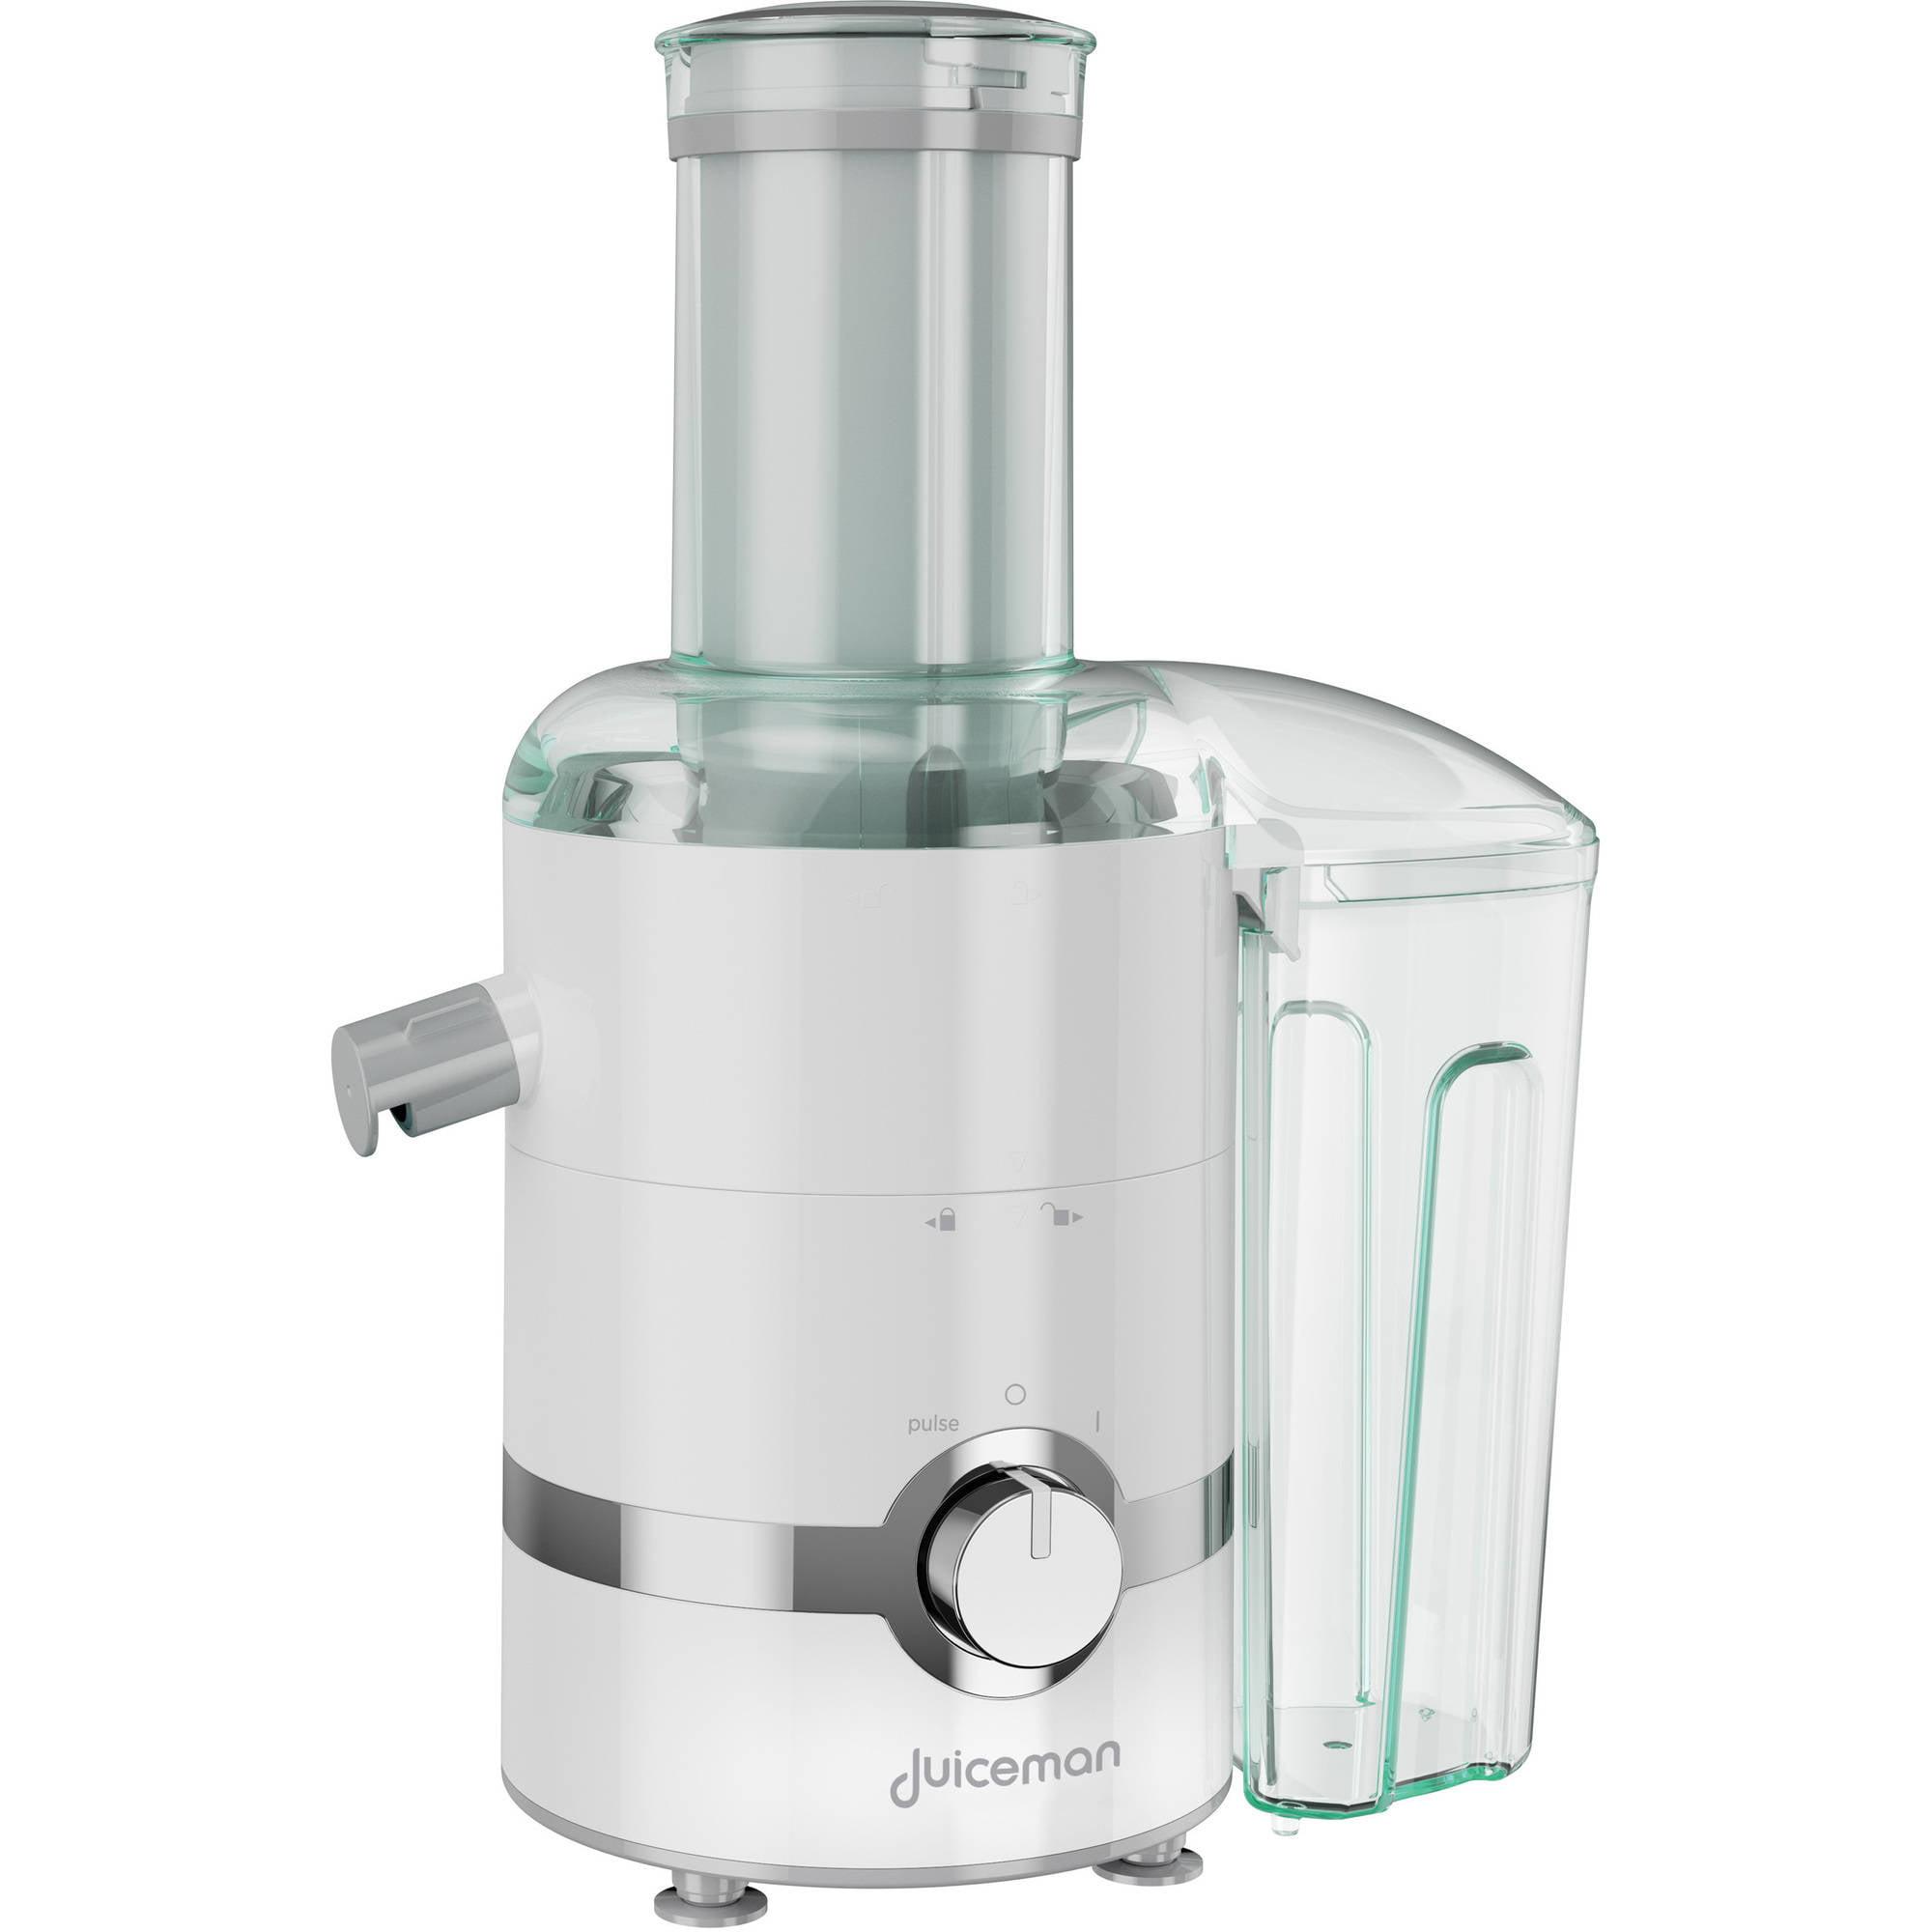 Juiceman 3-In-1 Total Juicer and Blender with Citrus, JM3000